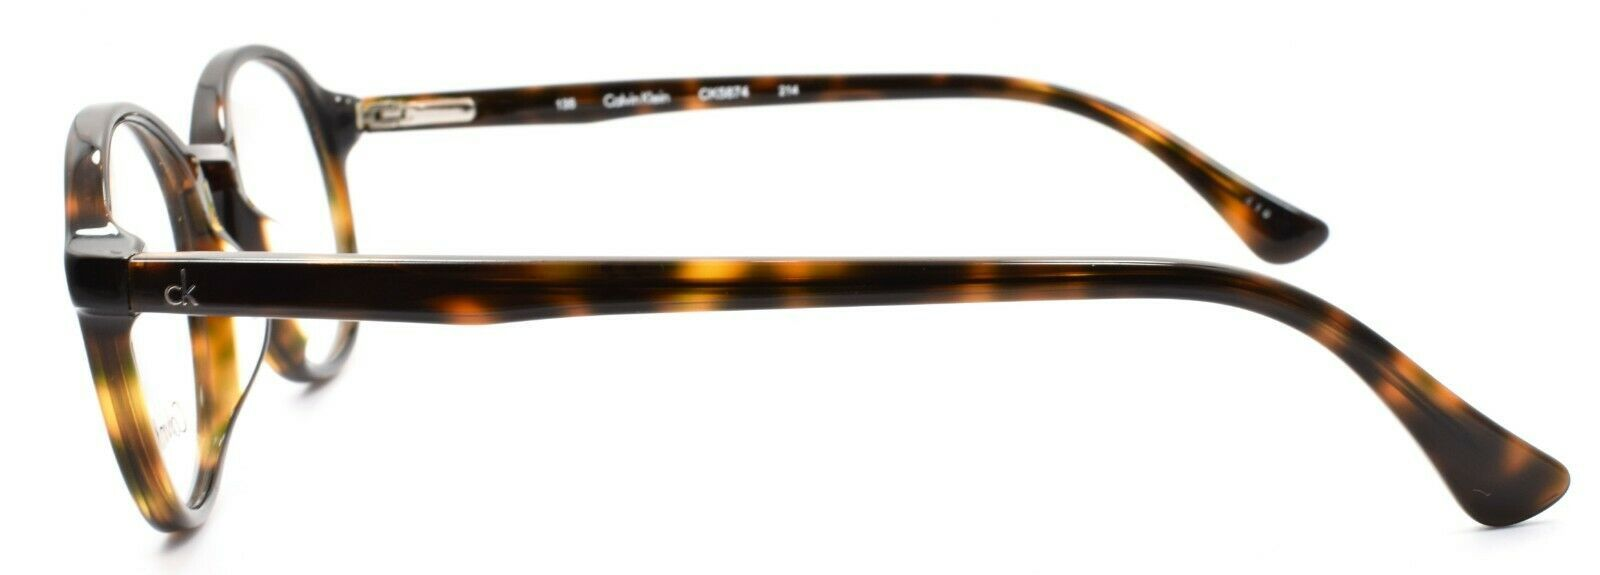 Calvin Klein CK5874 214 Unisex Eyeglasses Frames SMALL Round 48-20-135 Havana